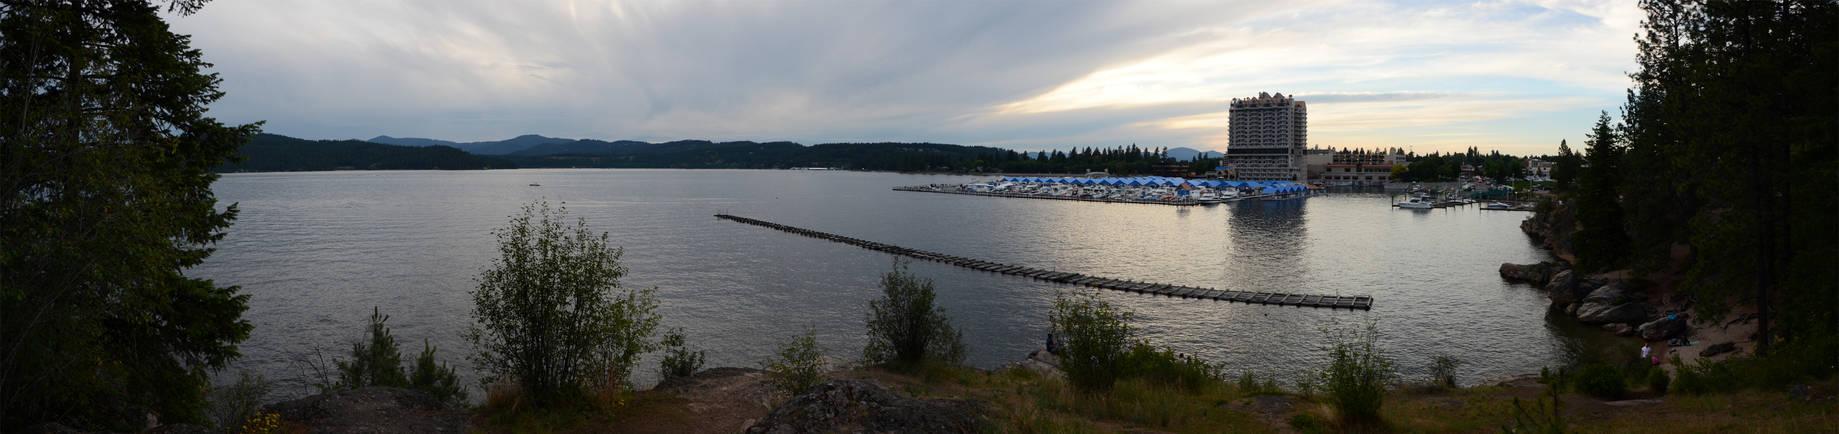 Lake Coeur d'Alene 2012-06-28